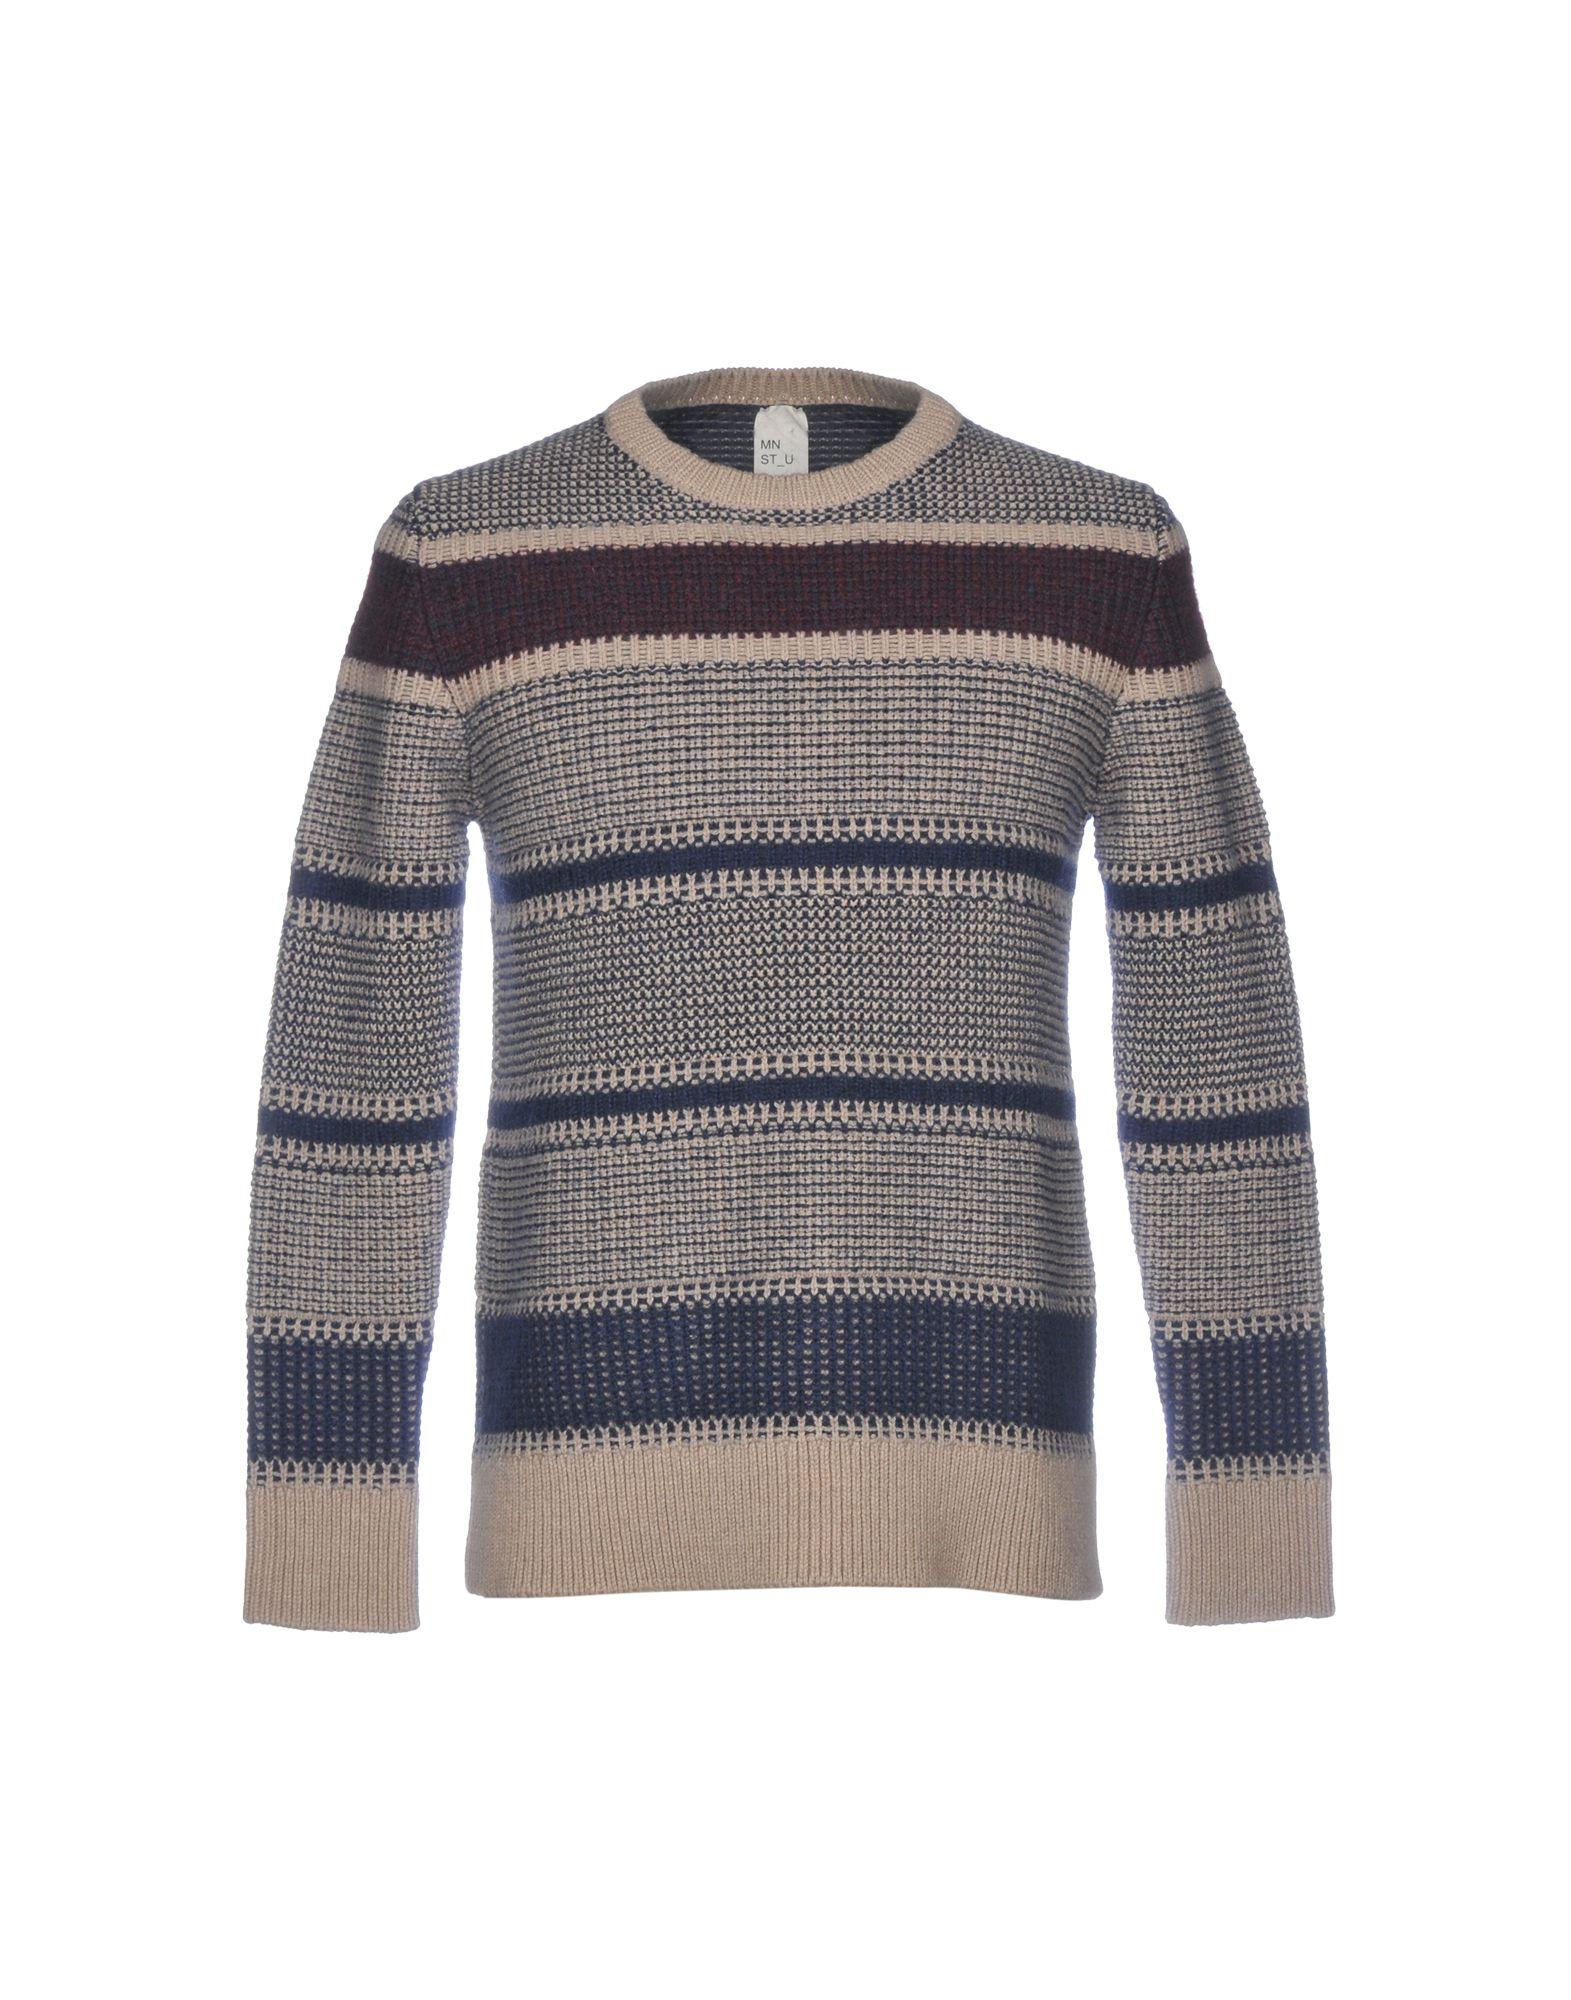 MNST U by MANOSTORTI Свитер свитер мужской u brand